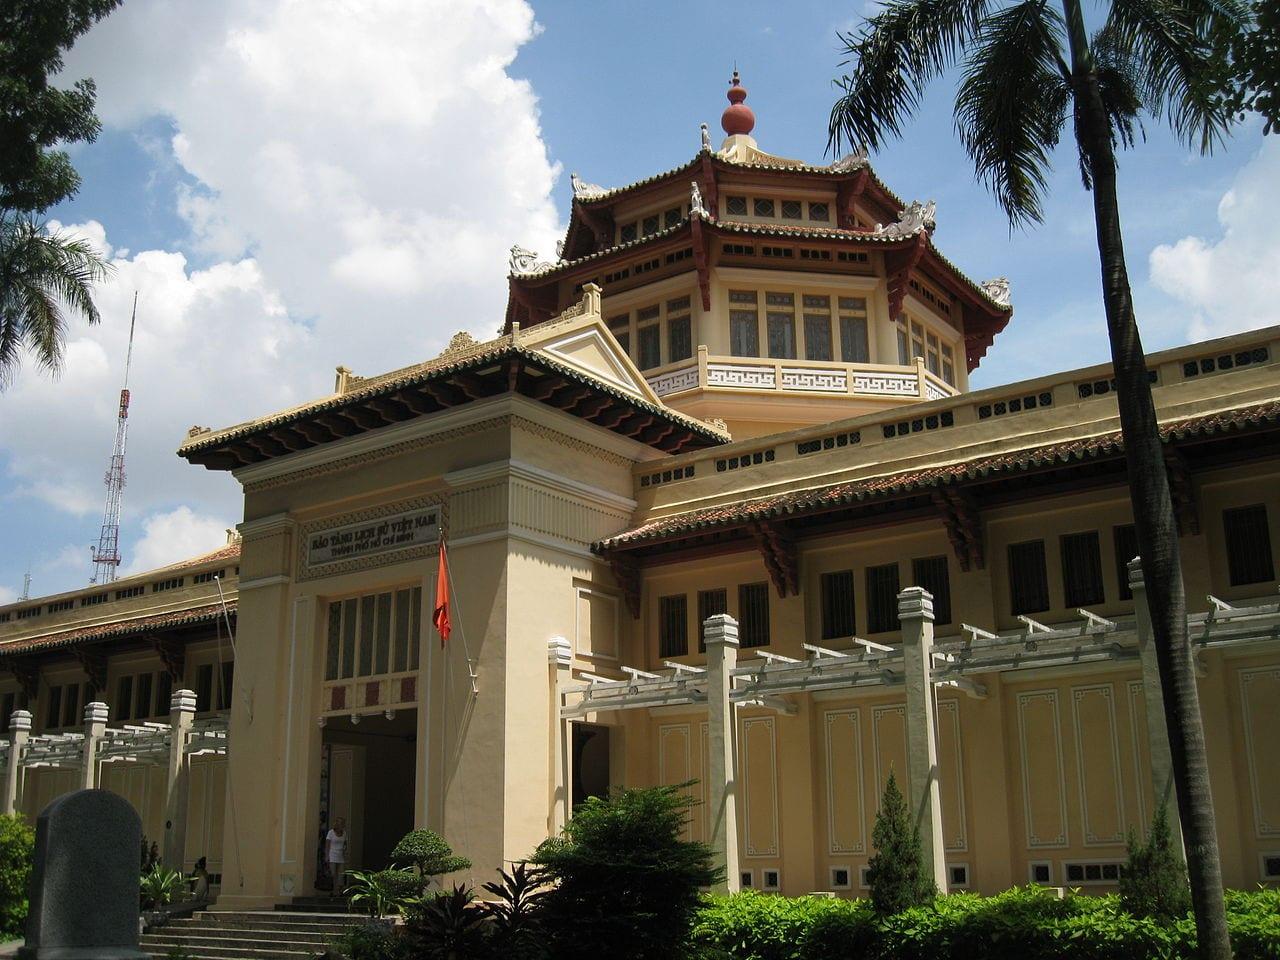 Vietnam History Museum in Saigon